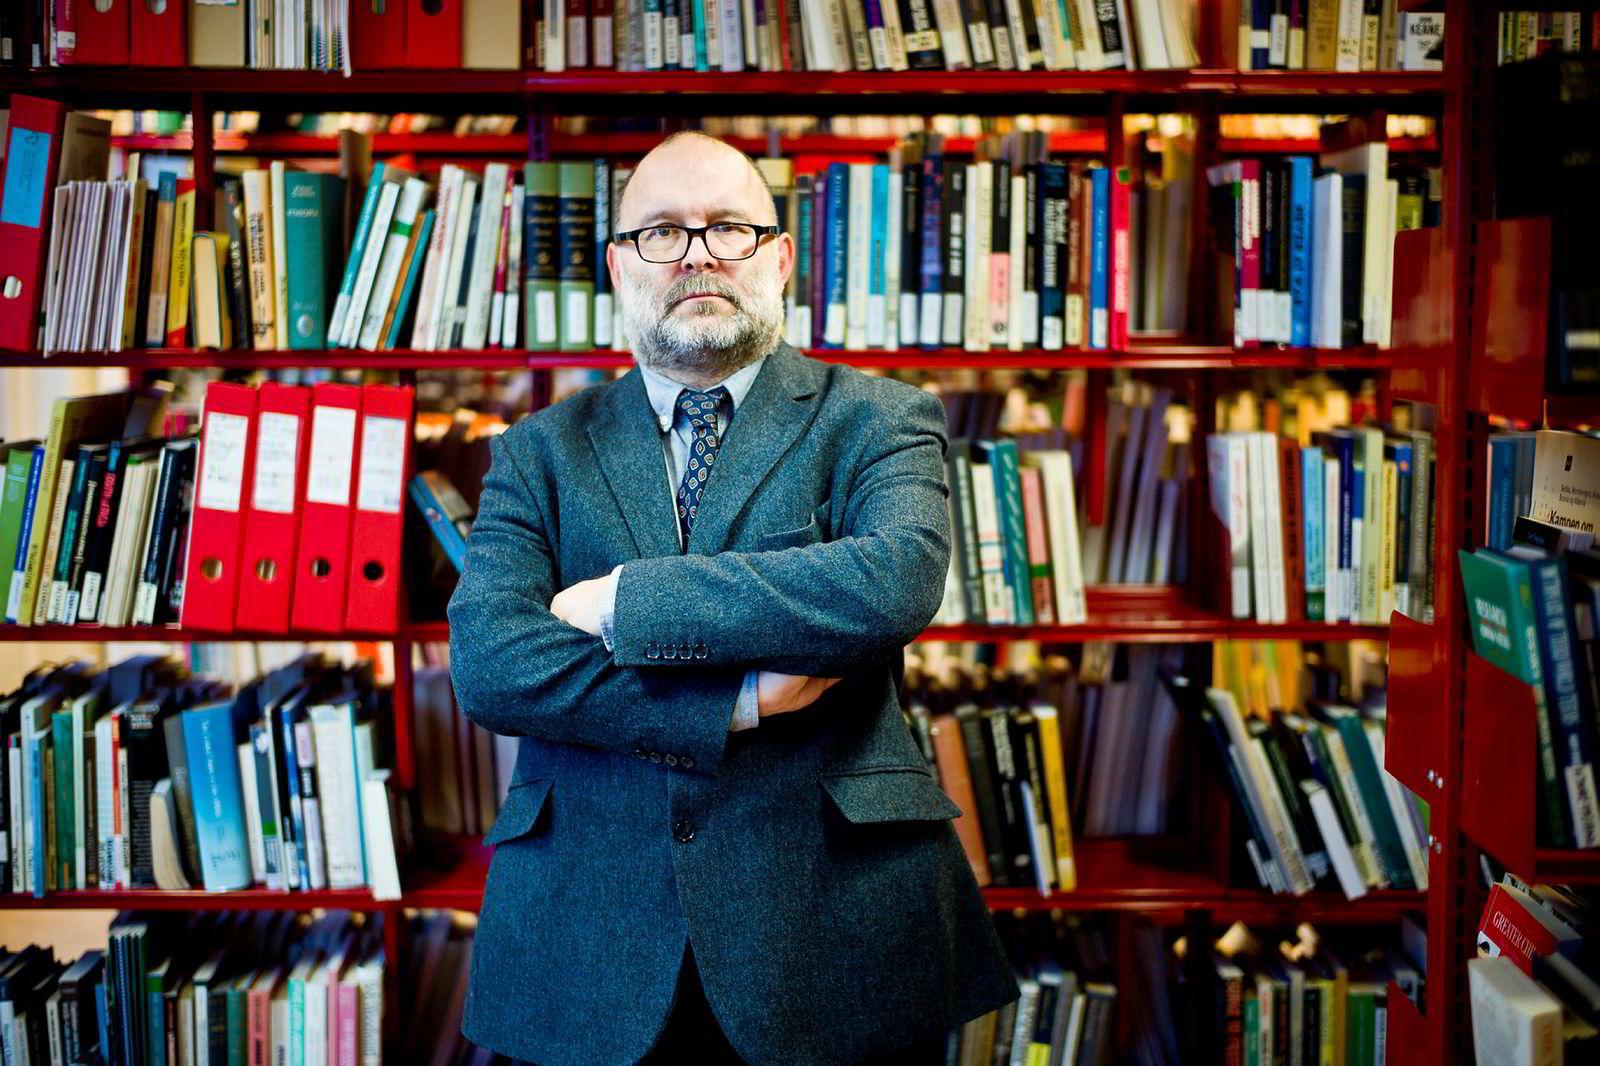 Jakub M. Godzimirski er forsker ved Nupi, og betegner utviklingen i EU som en seier for Russland.